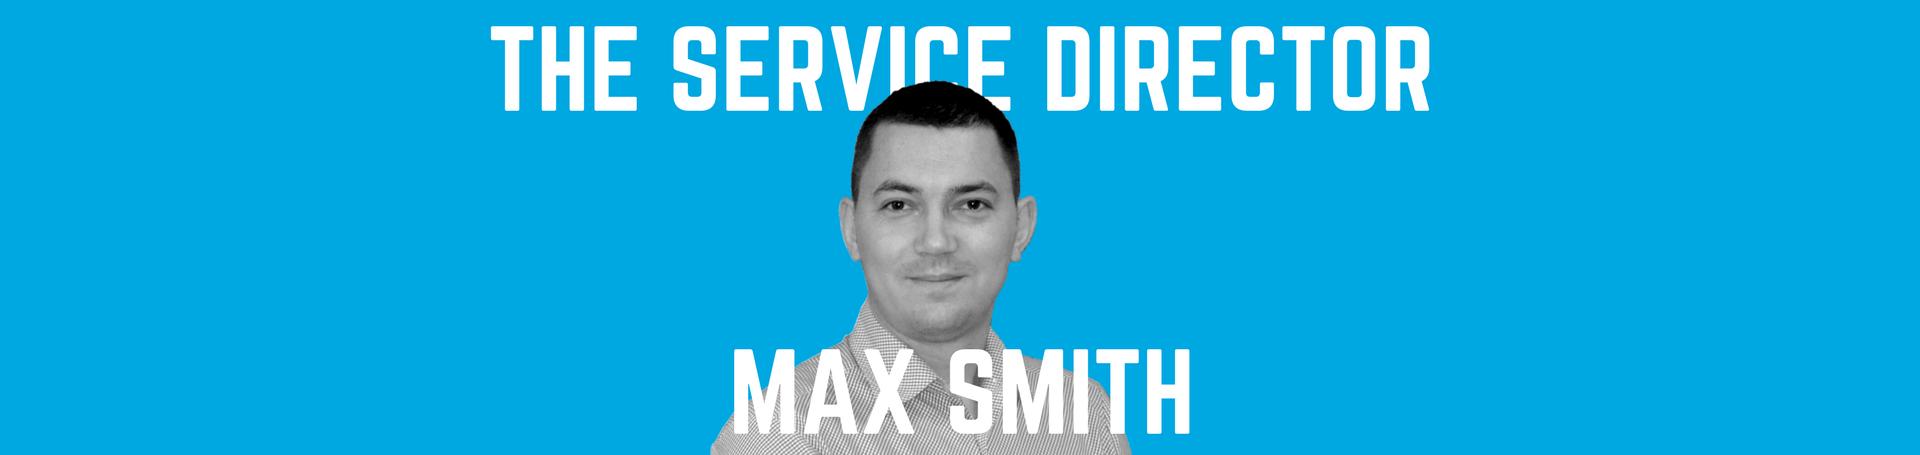 Max Smith